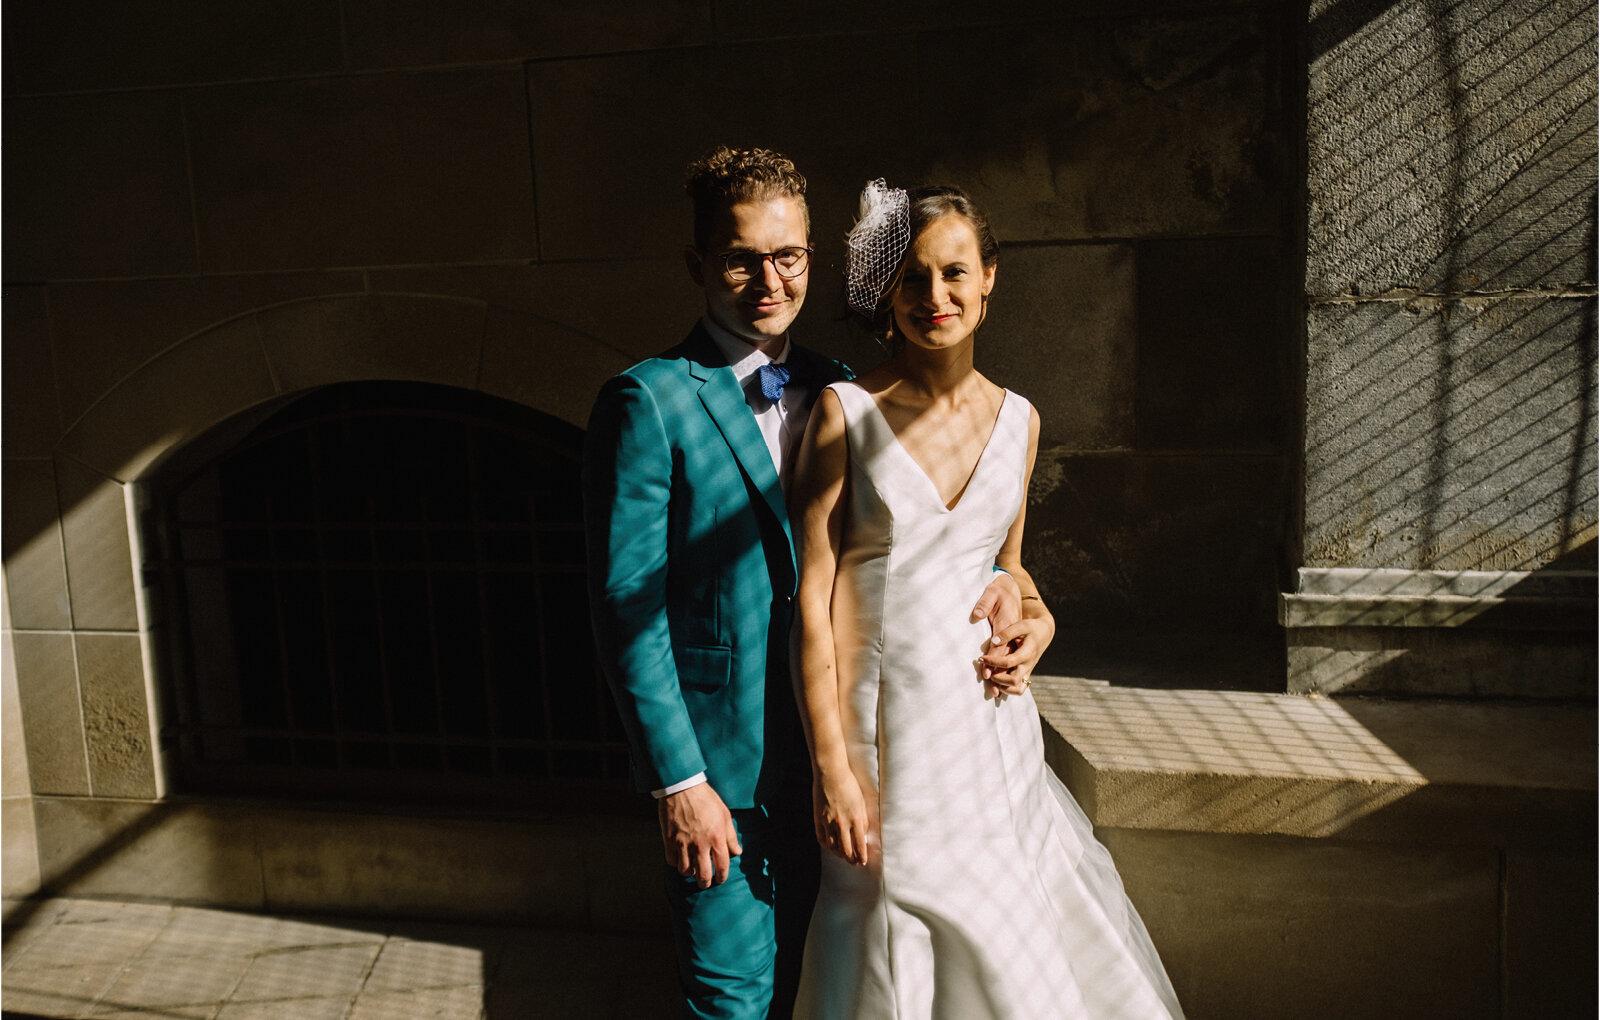 ottawa art gallery bride and groom wedding portrait